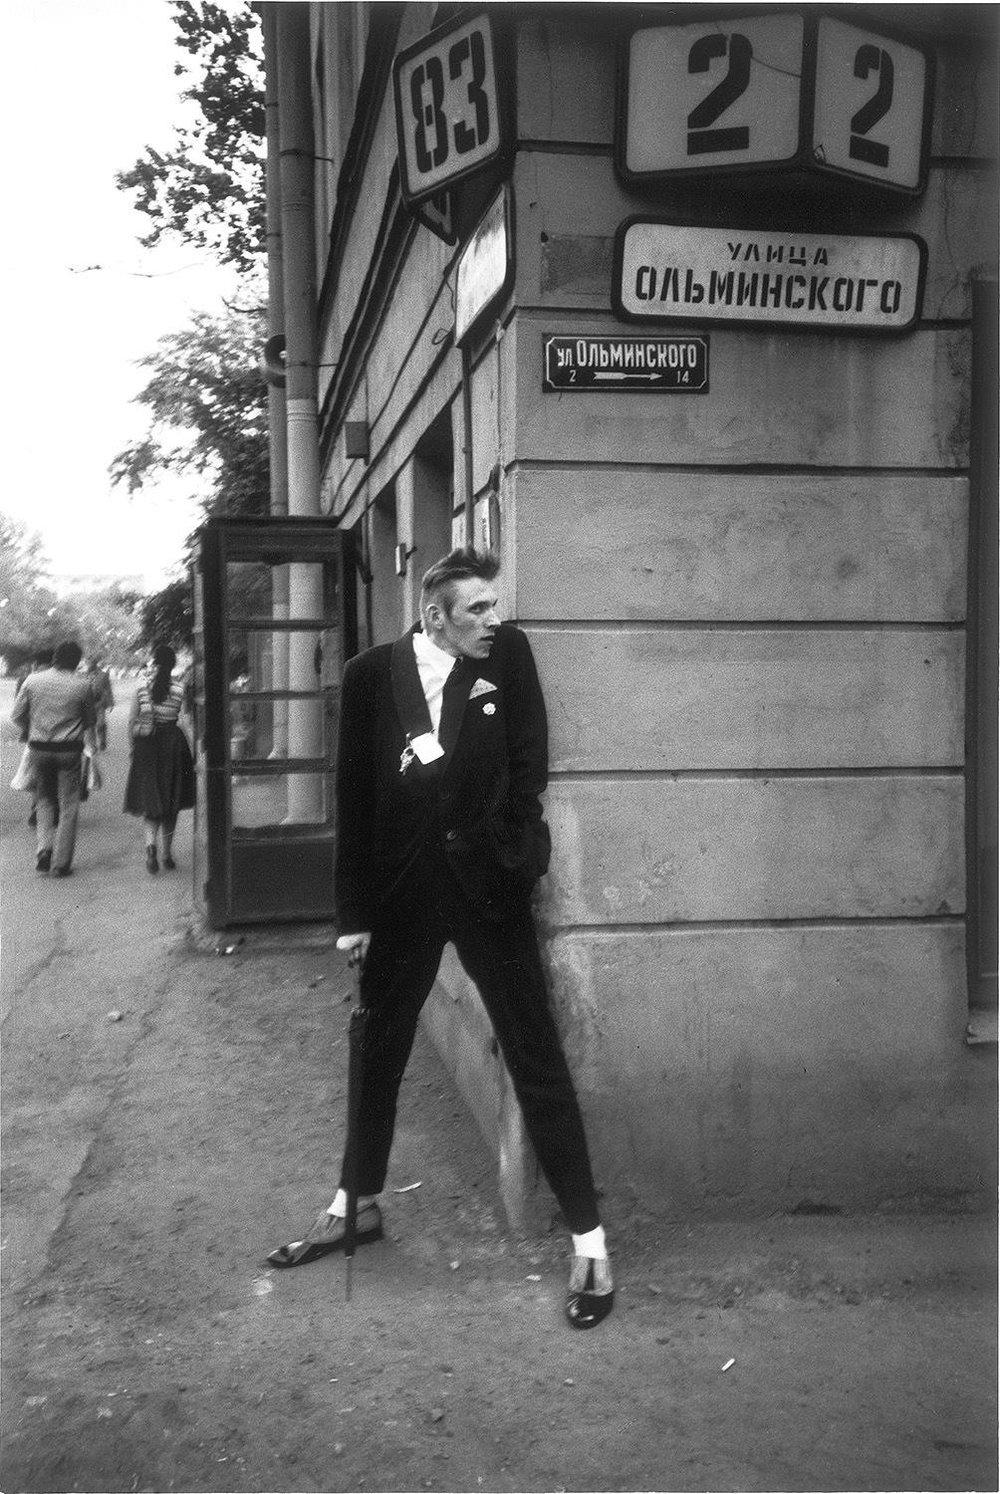 Joven neopunk en Moscú en 1986. Fotografía: Igor Mukhin